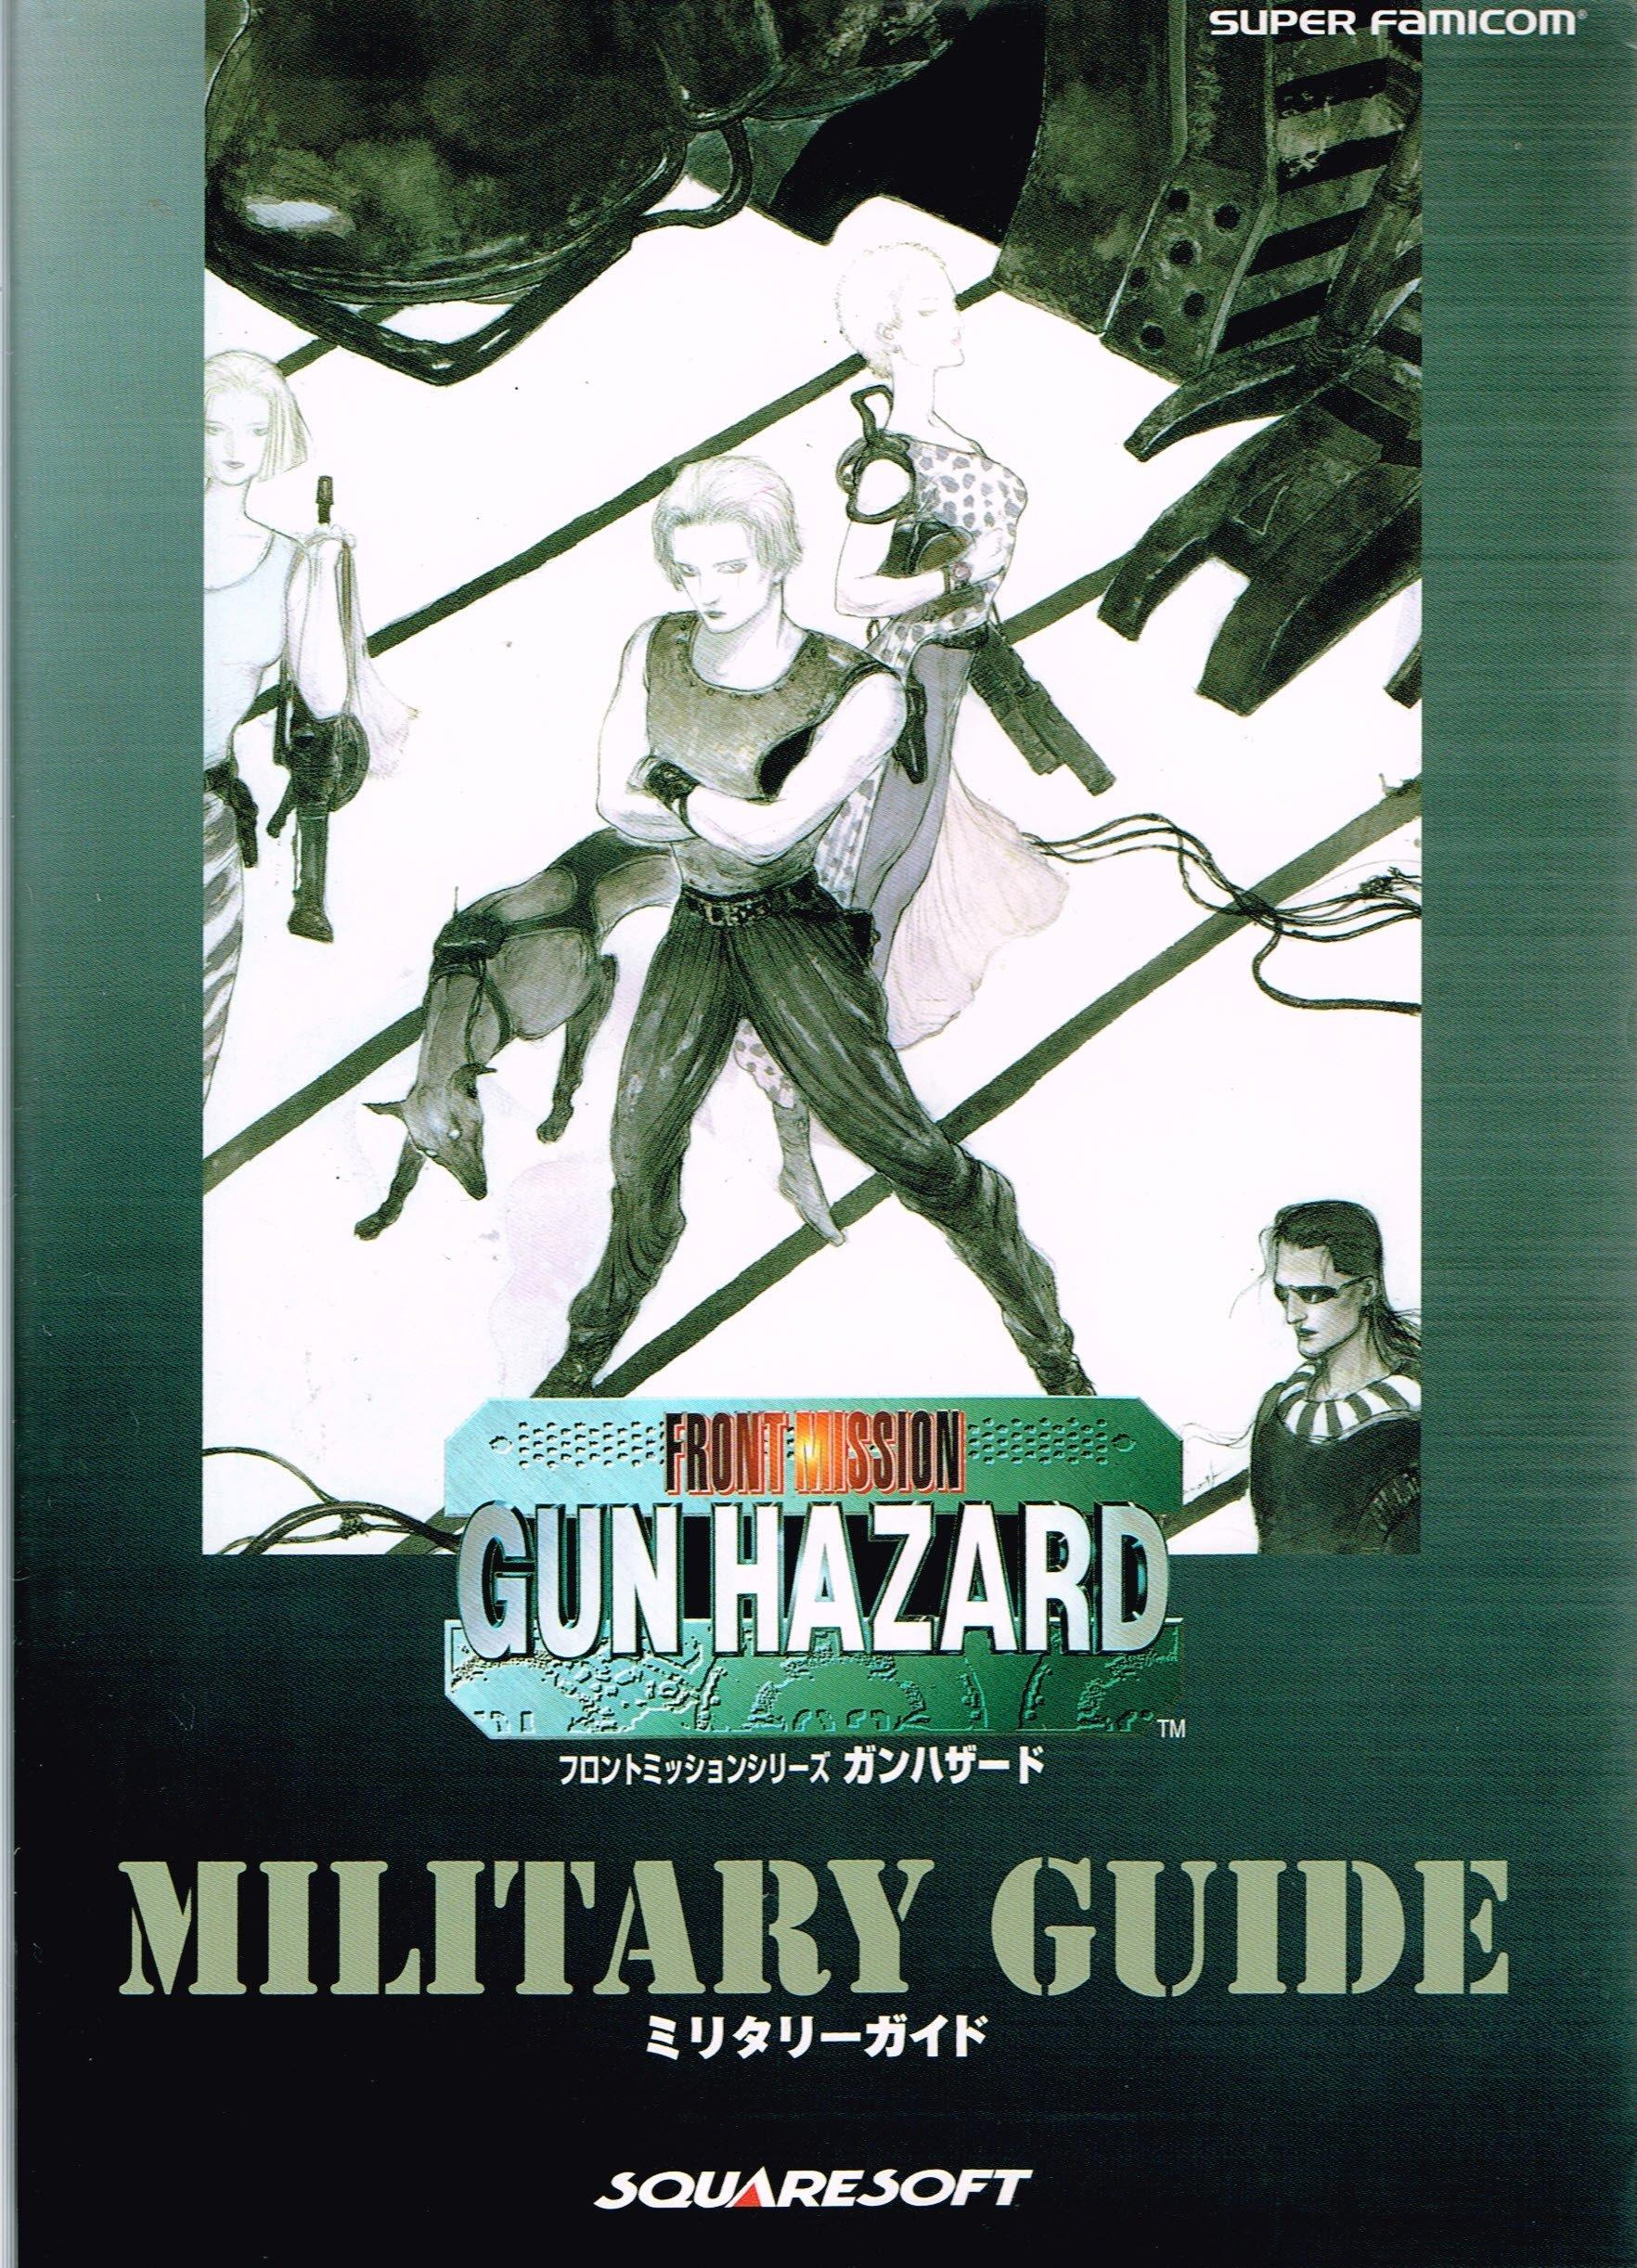 Front Mission Series Gun Hazard Military Guide Super Nintendo